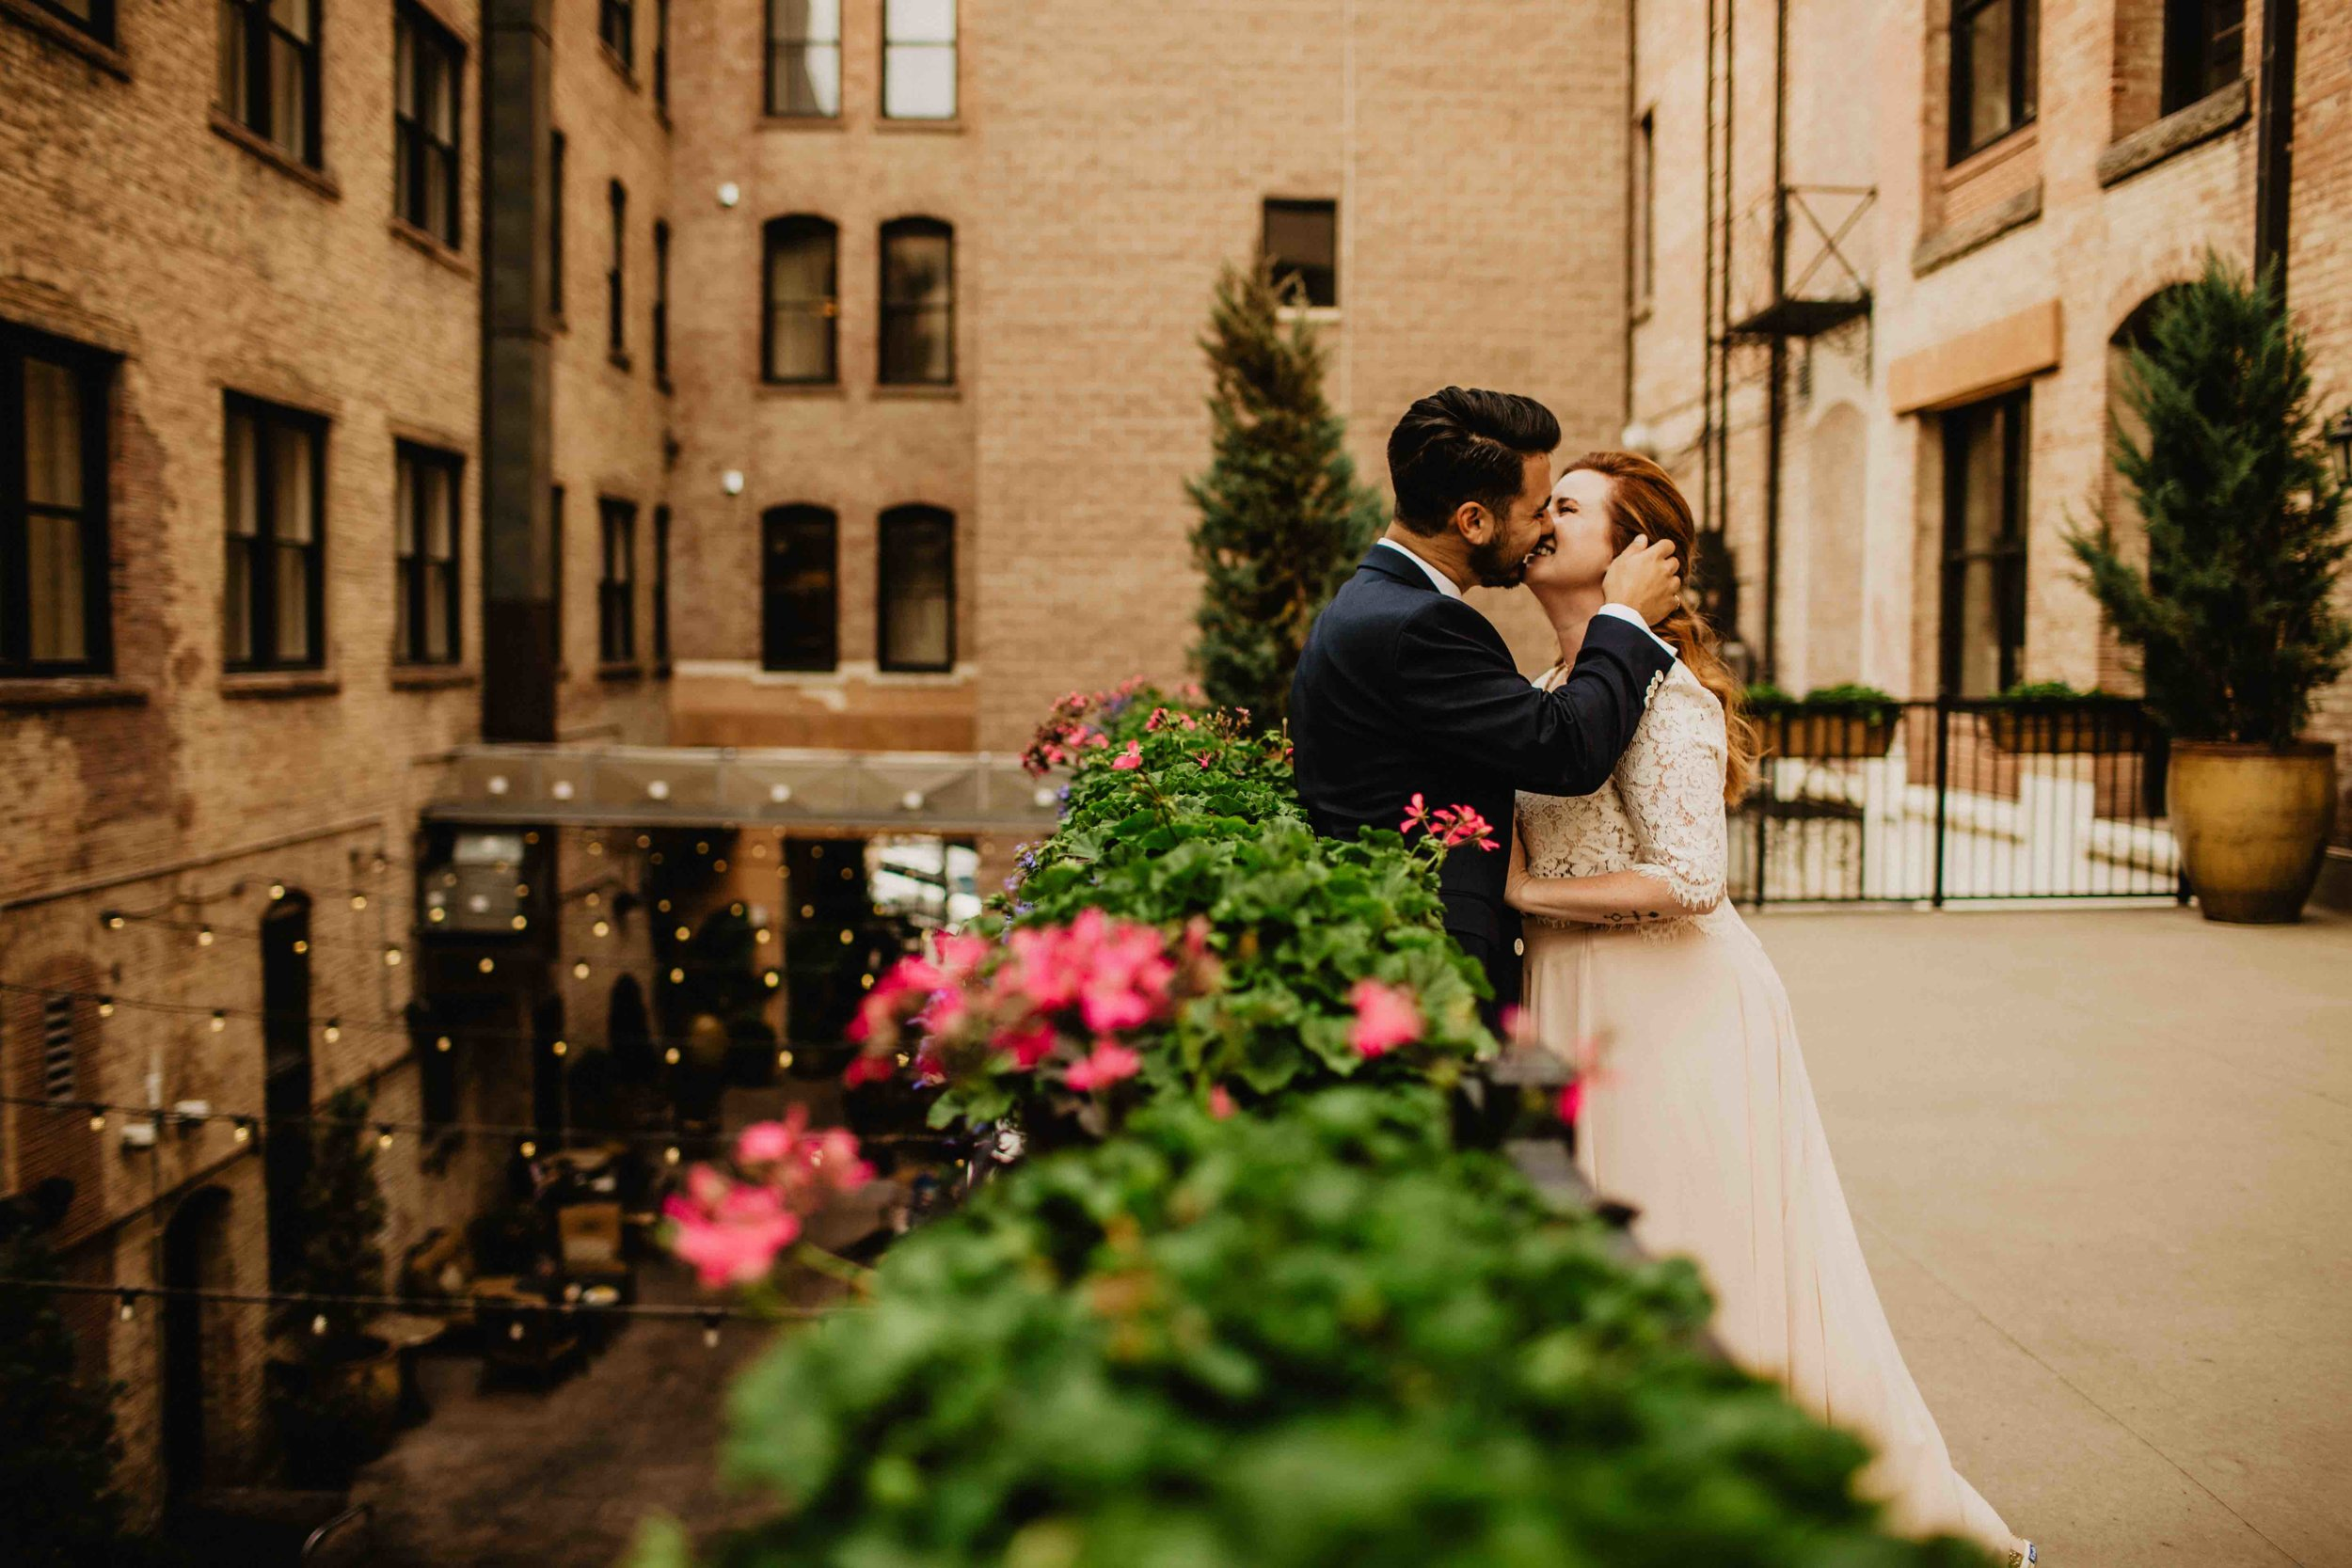 -colorado-wedding-photographer-denver-springs-vail-607A3715.jpeg